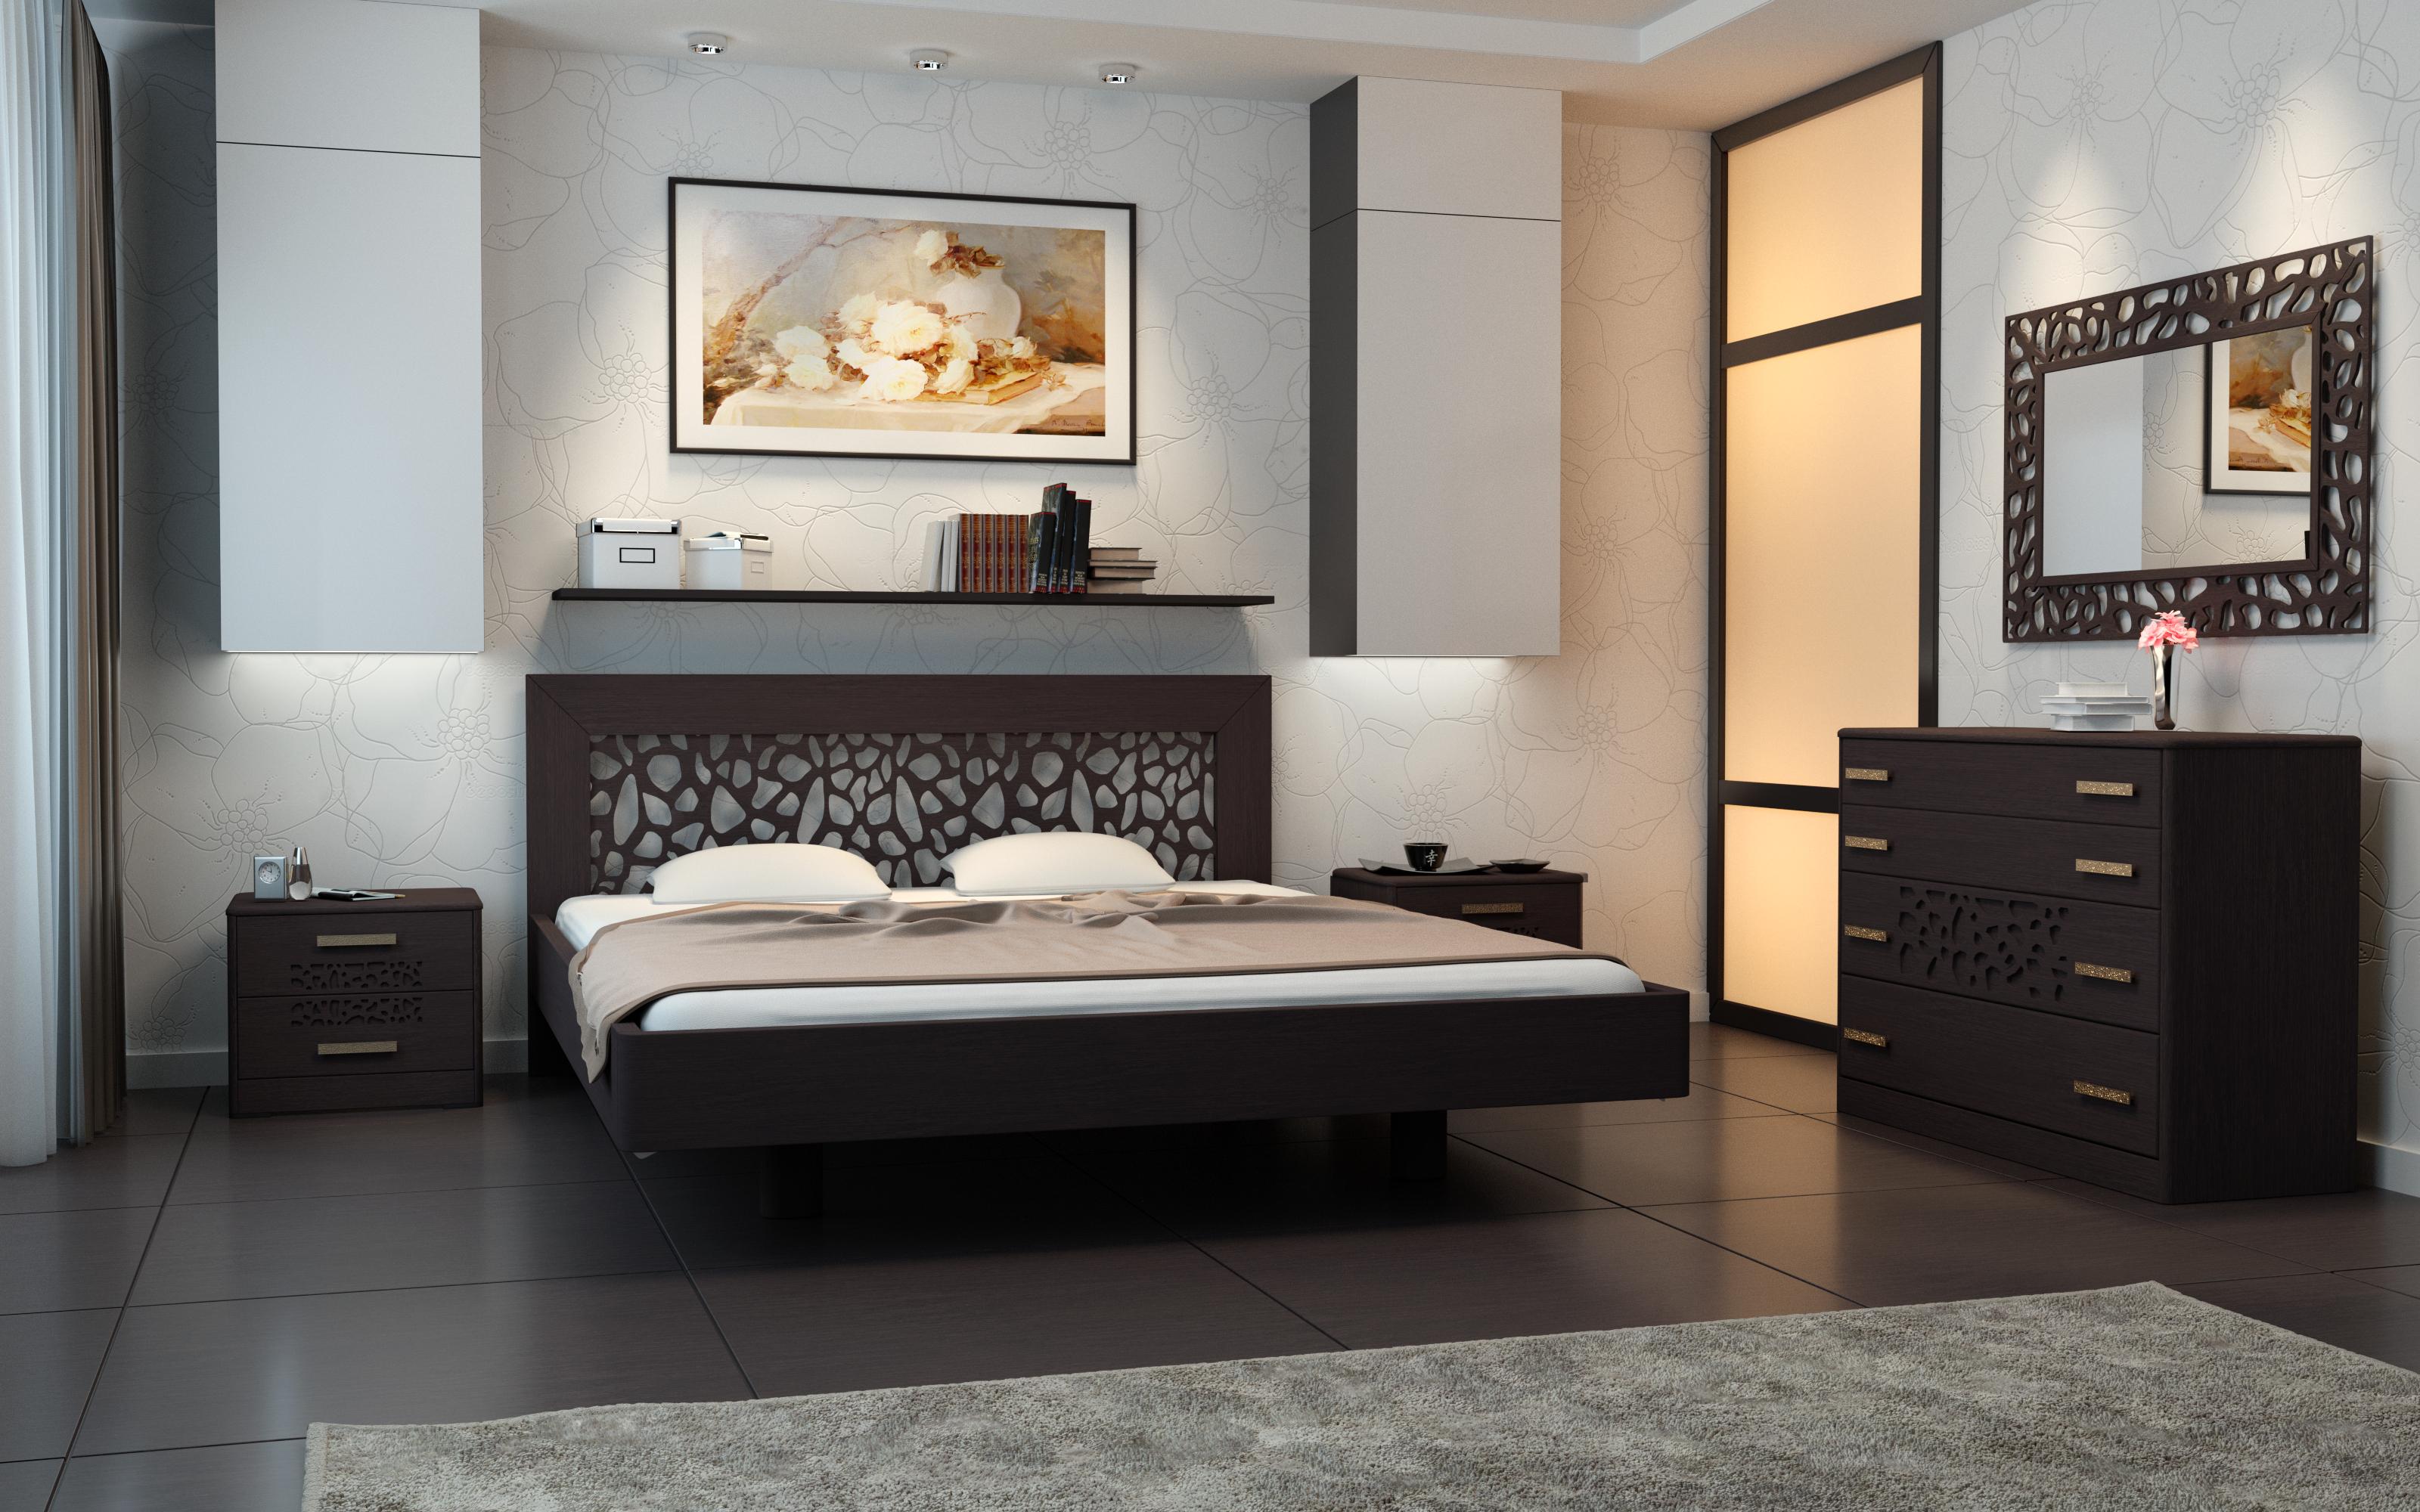 Кровать DreamLine Веро (Ясень) Кровать Веро (Ясень) фото